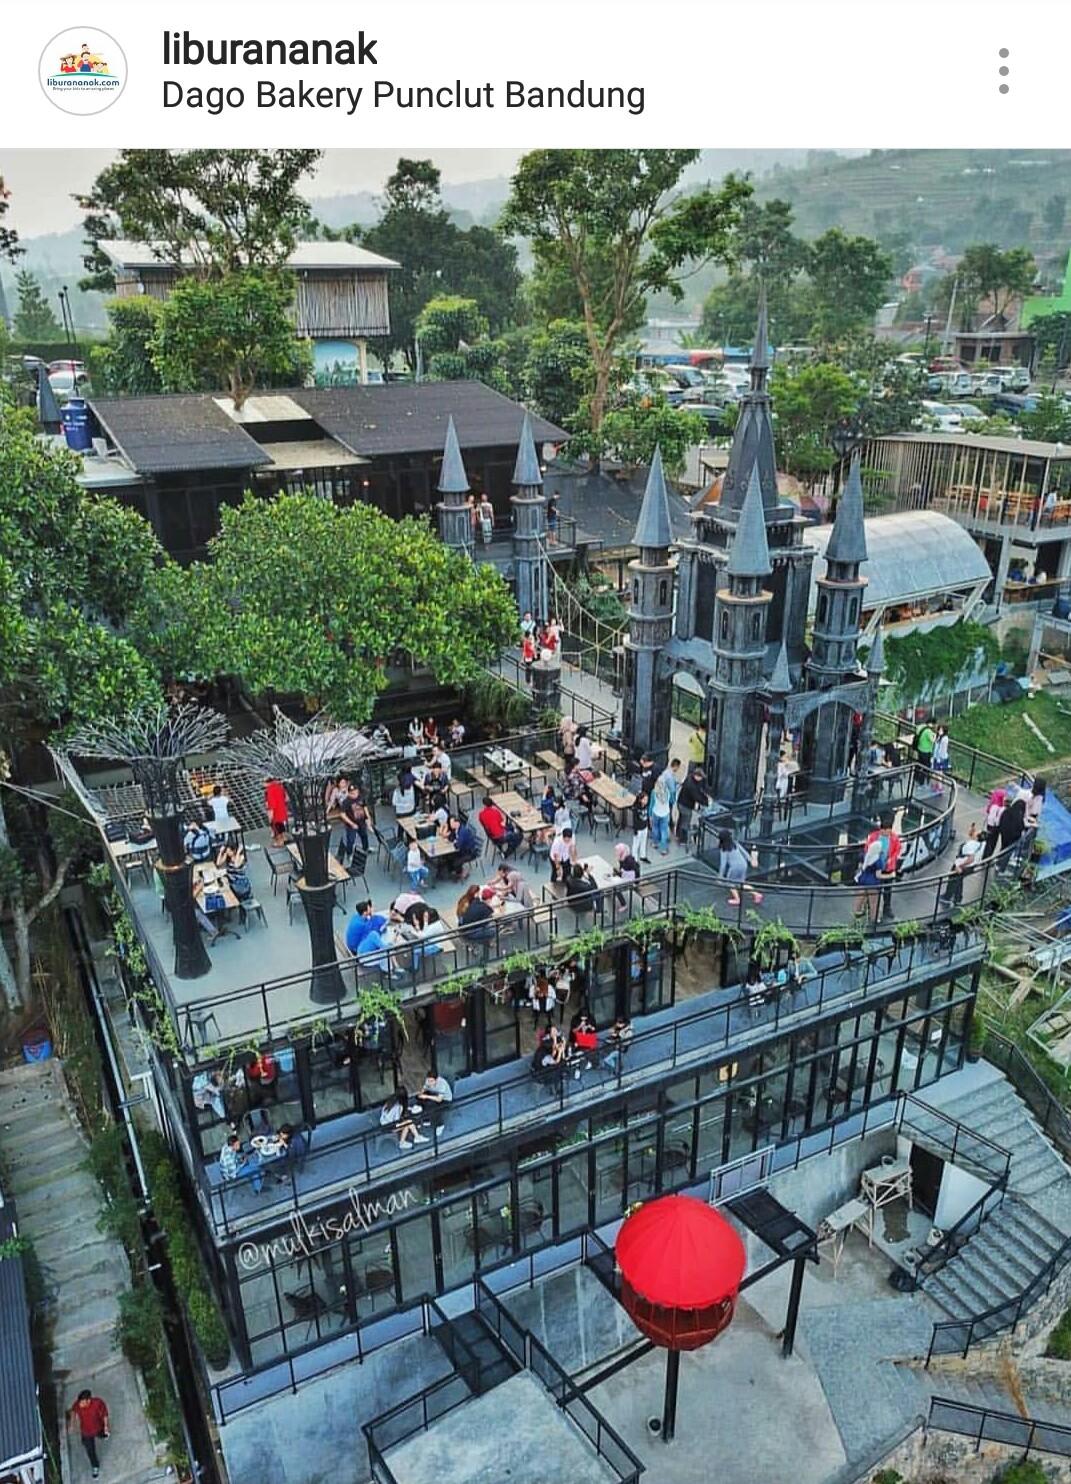 Dago Bakery Punclut Bandung - Kids Holiday Spots - Liburan Anak